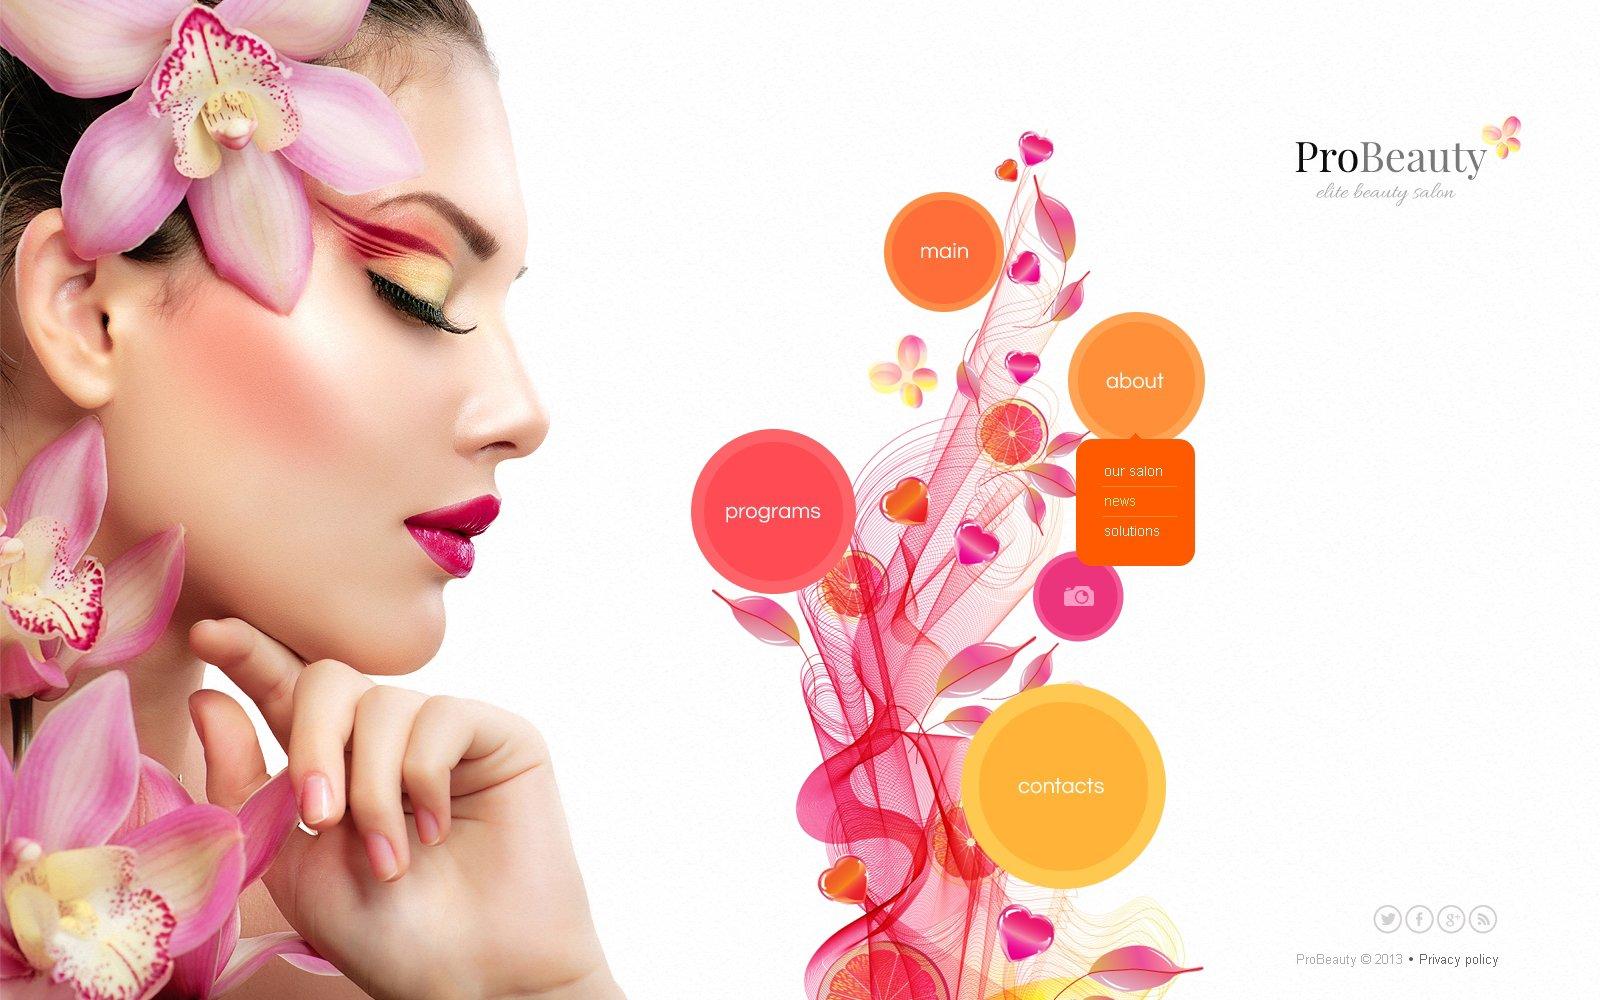 Best Pro Beauty Salon Javascript Based Design 45344 Sale Super Low Price Free Bonuses Instant Download